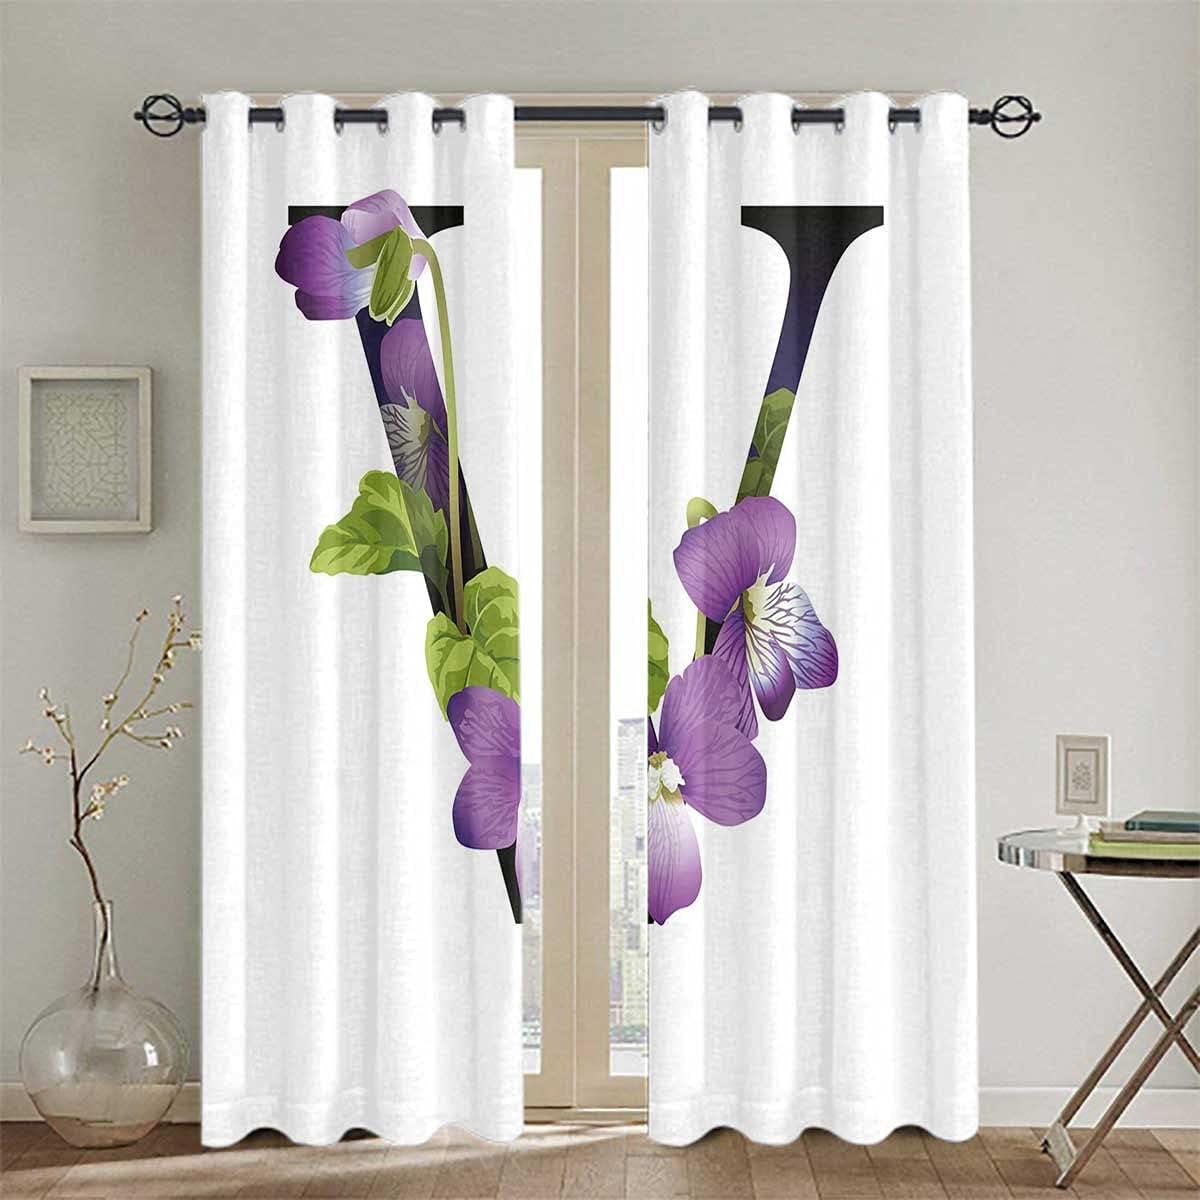 Special Campaign Room Darkening Blackout Curtain Grommets Viola Reservation Flower Bl Sororia